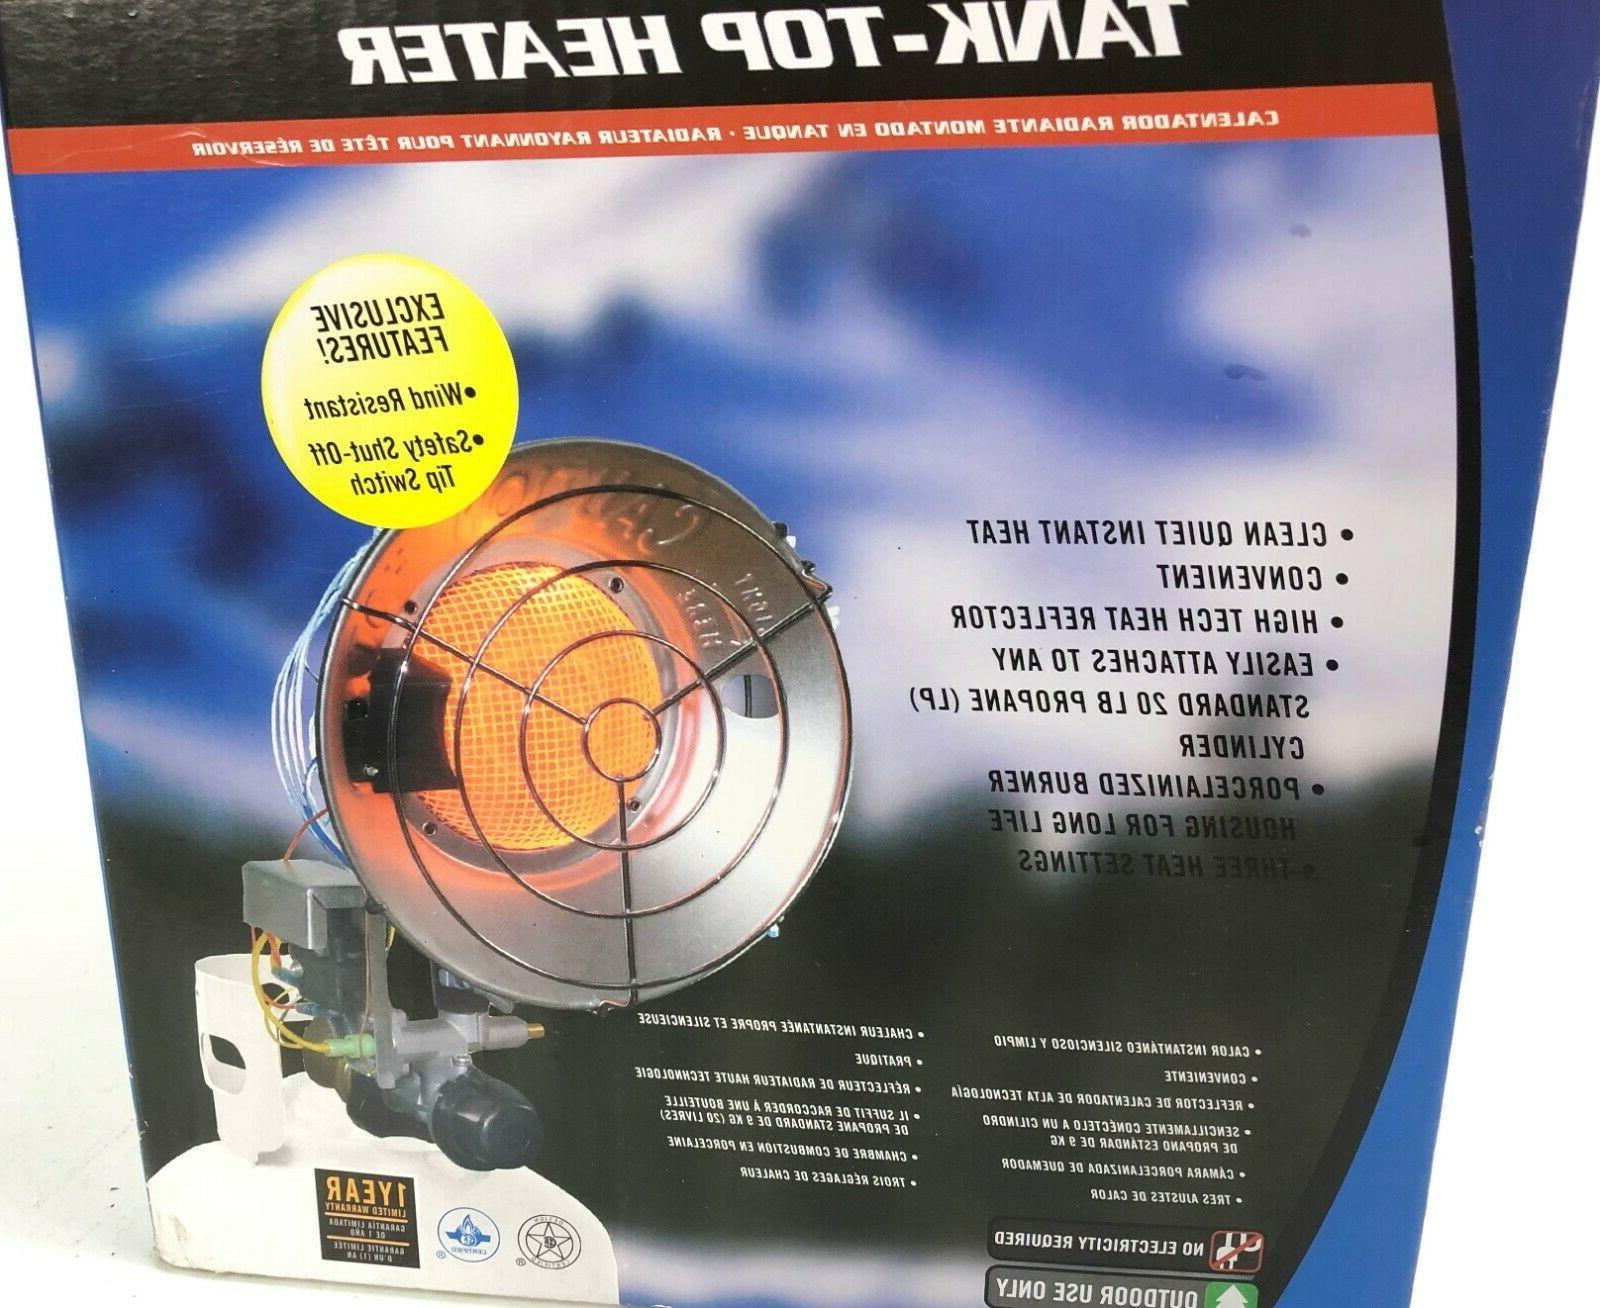 Protemp PT-16-TTC Tank Top Heater Safety